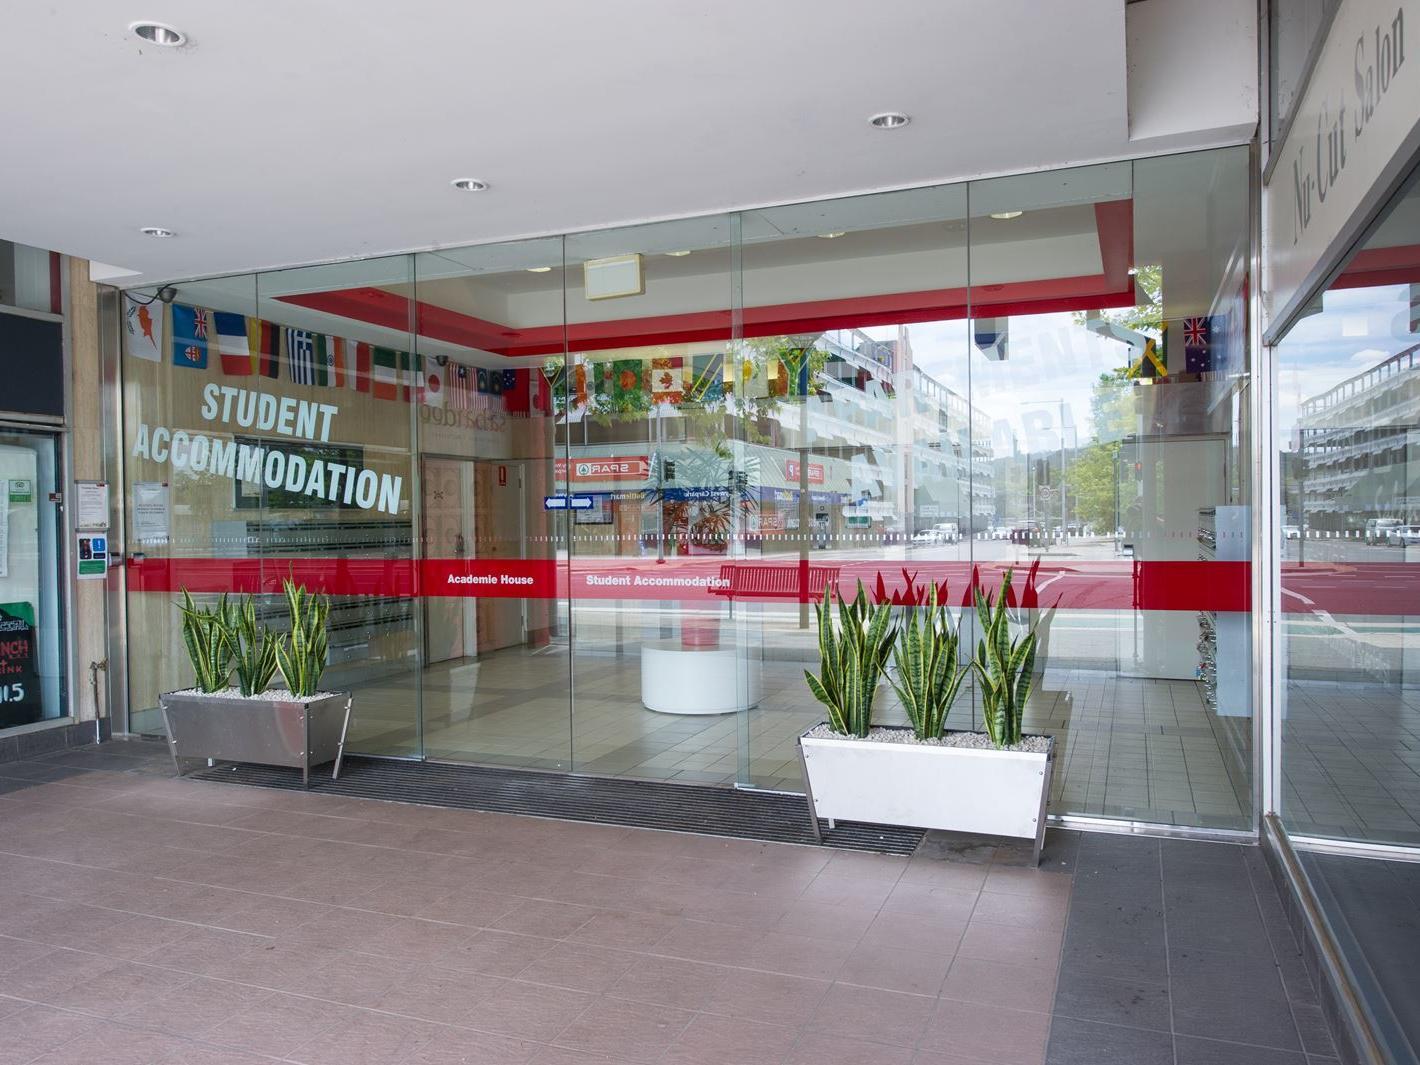 UniLodge Academie House_Front Entrance